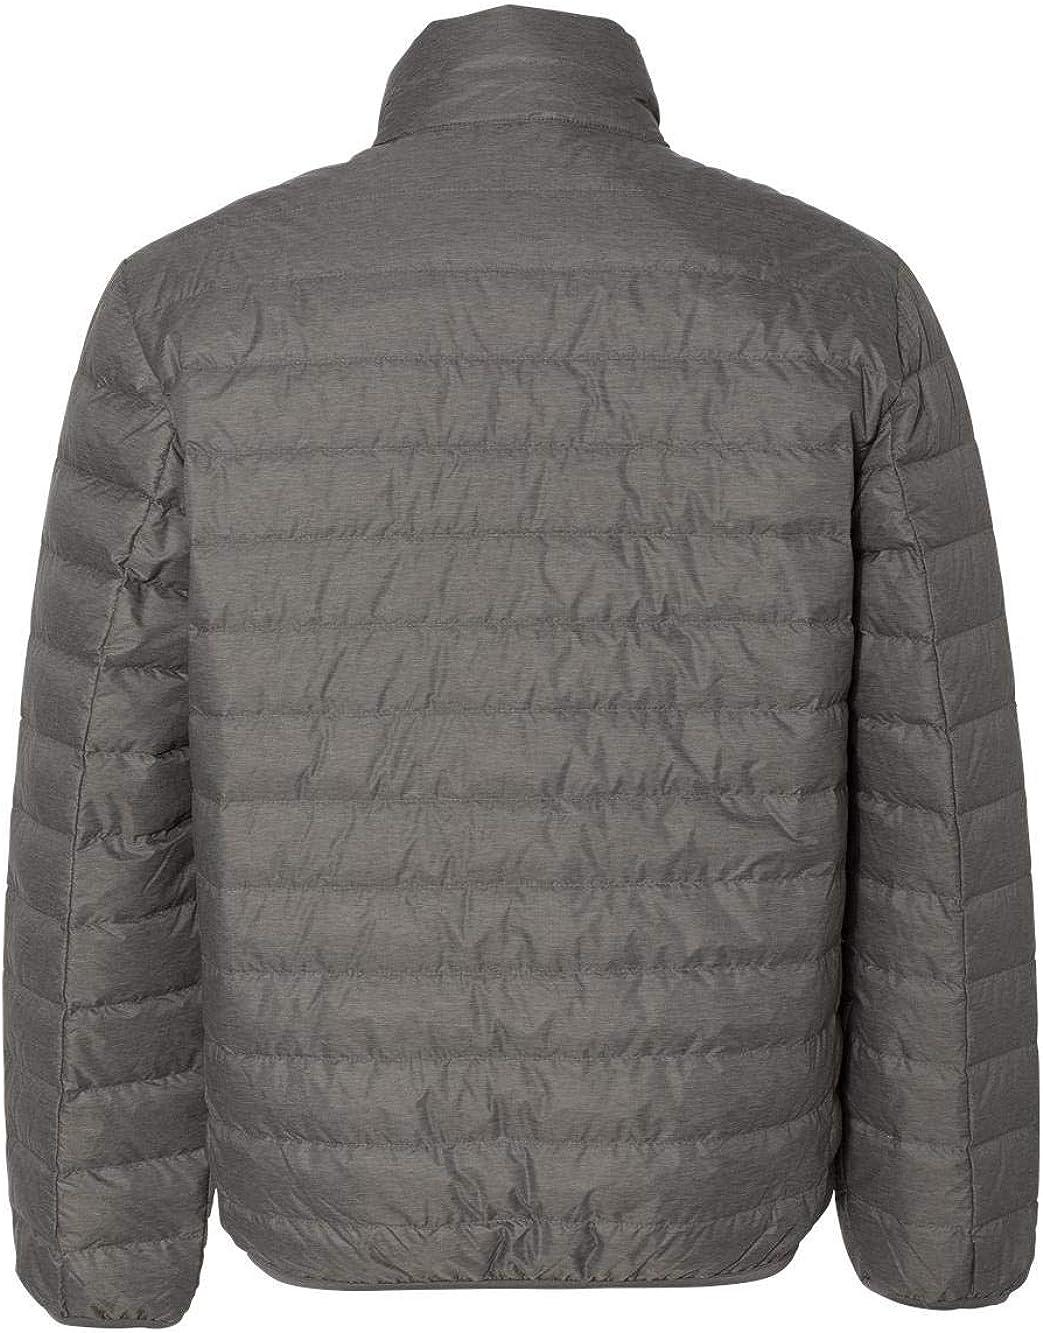 Weatherproof Mens Water Resistant Full Zip Jacket